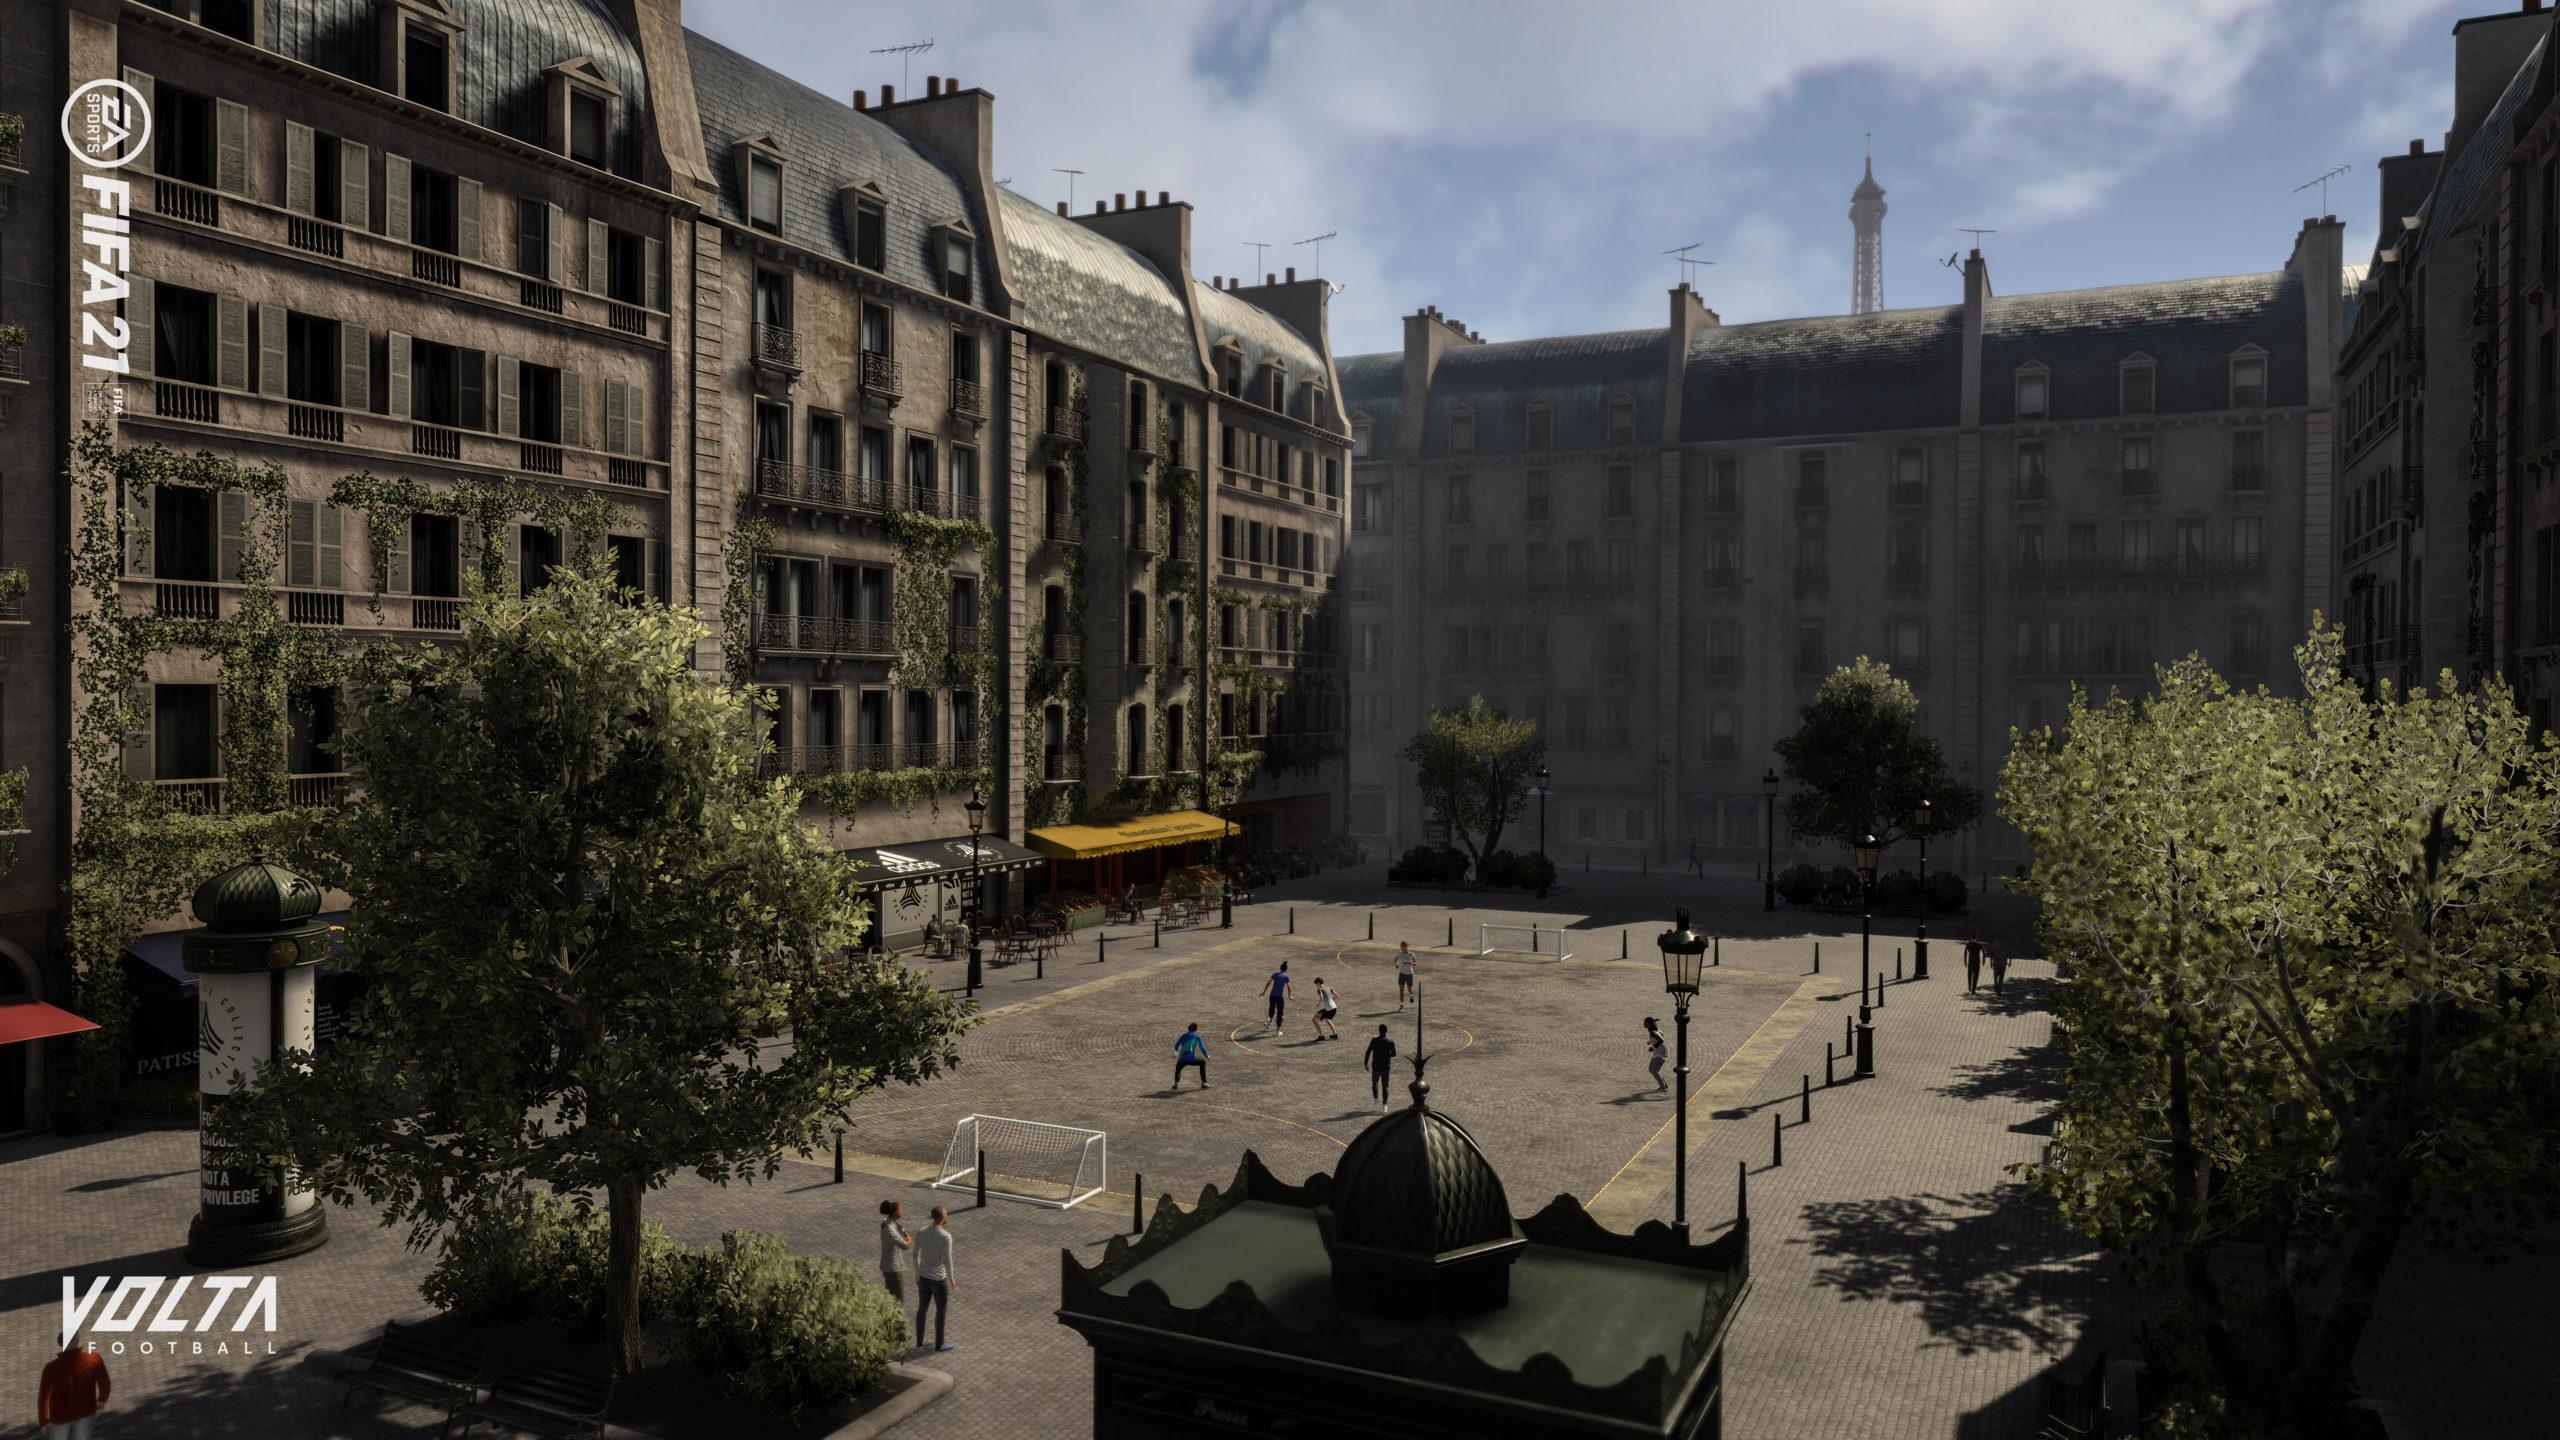 SSF_VOLTA_ENVIRO_PARIS_STREETS_HIRES_16X9_WM